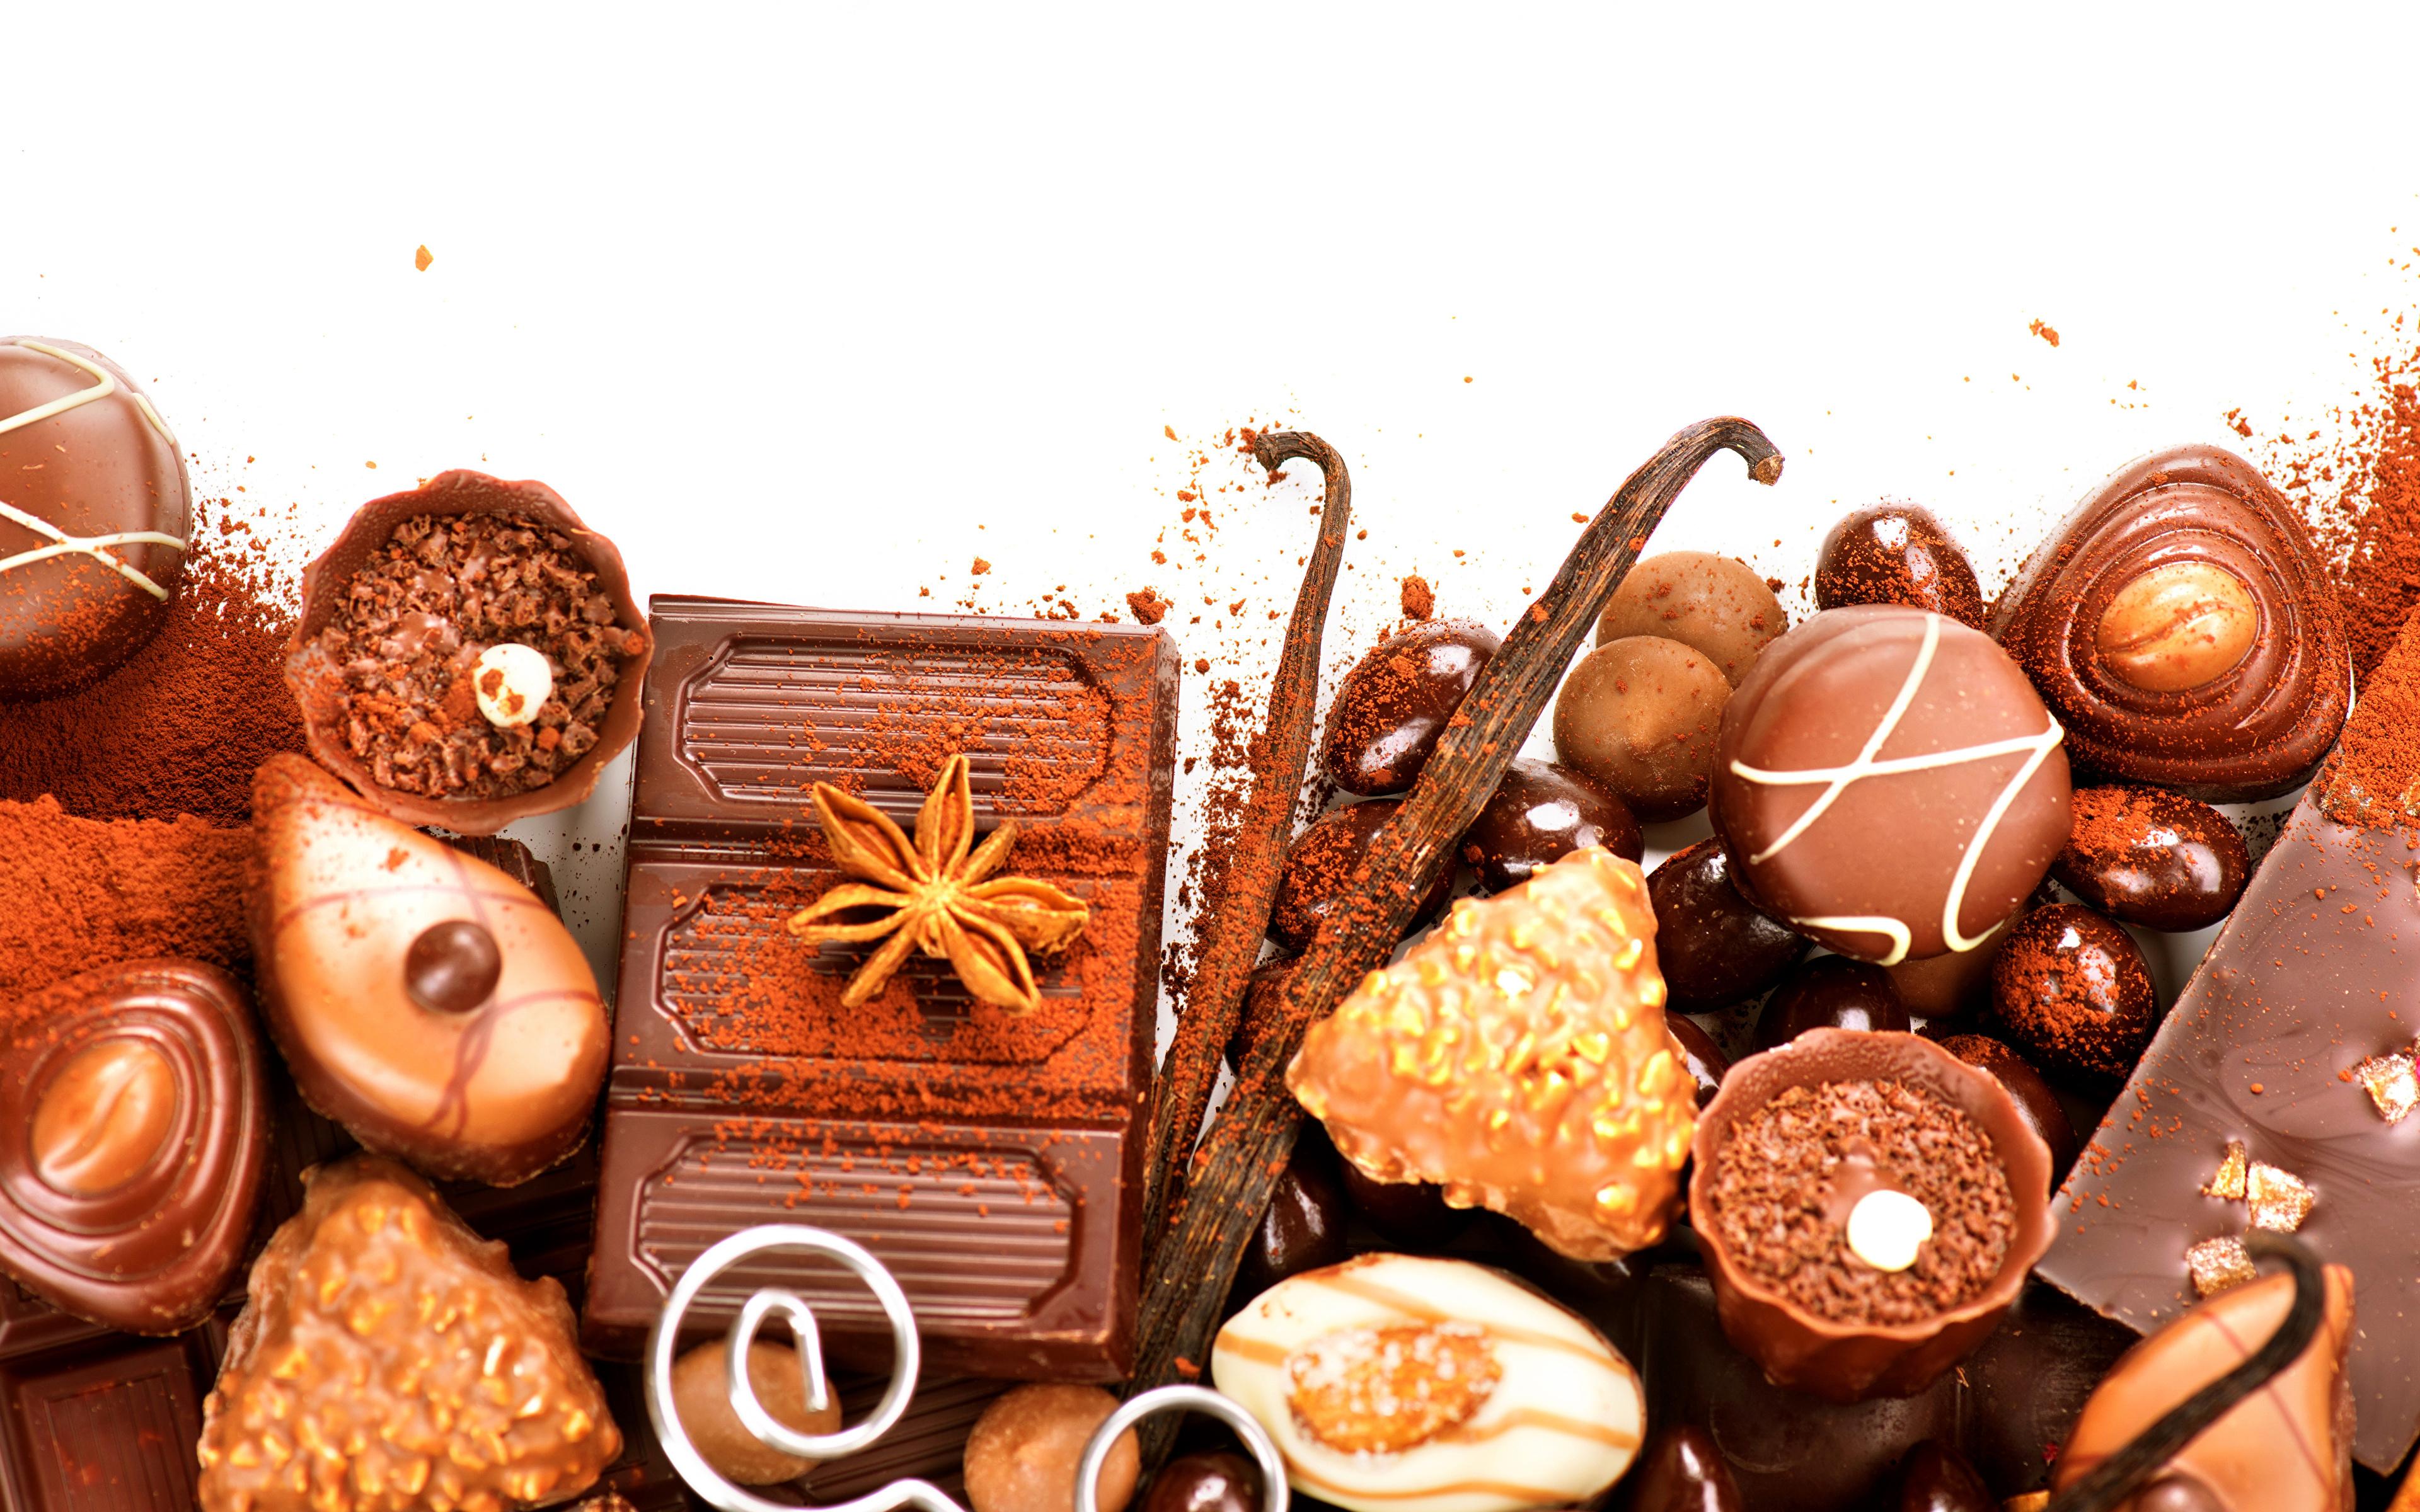 еда конфеты шоколад food candy chocolate бесплатно